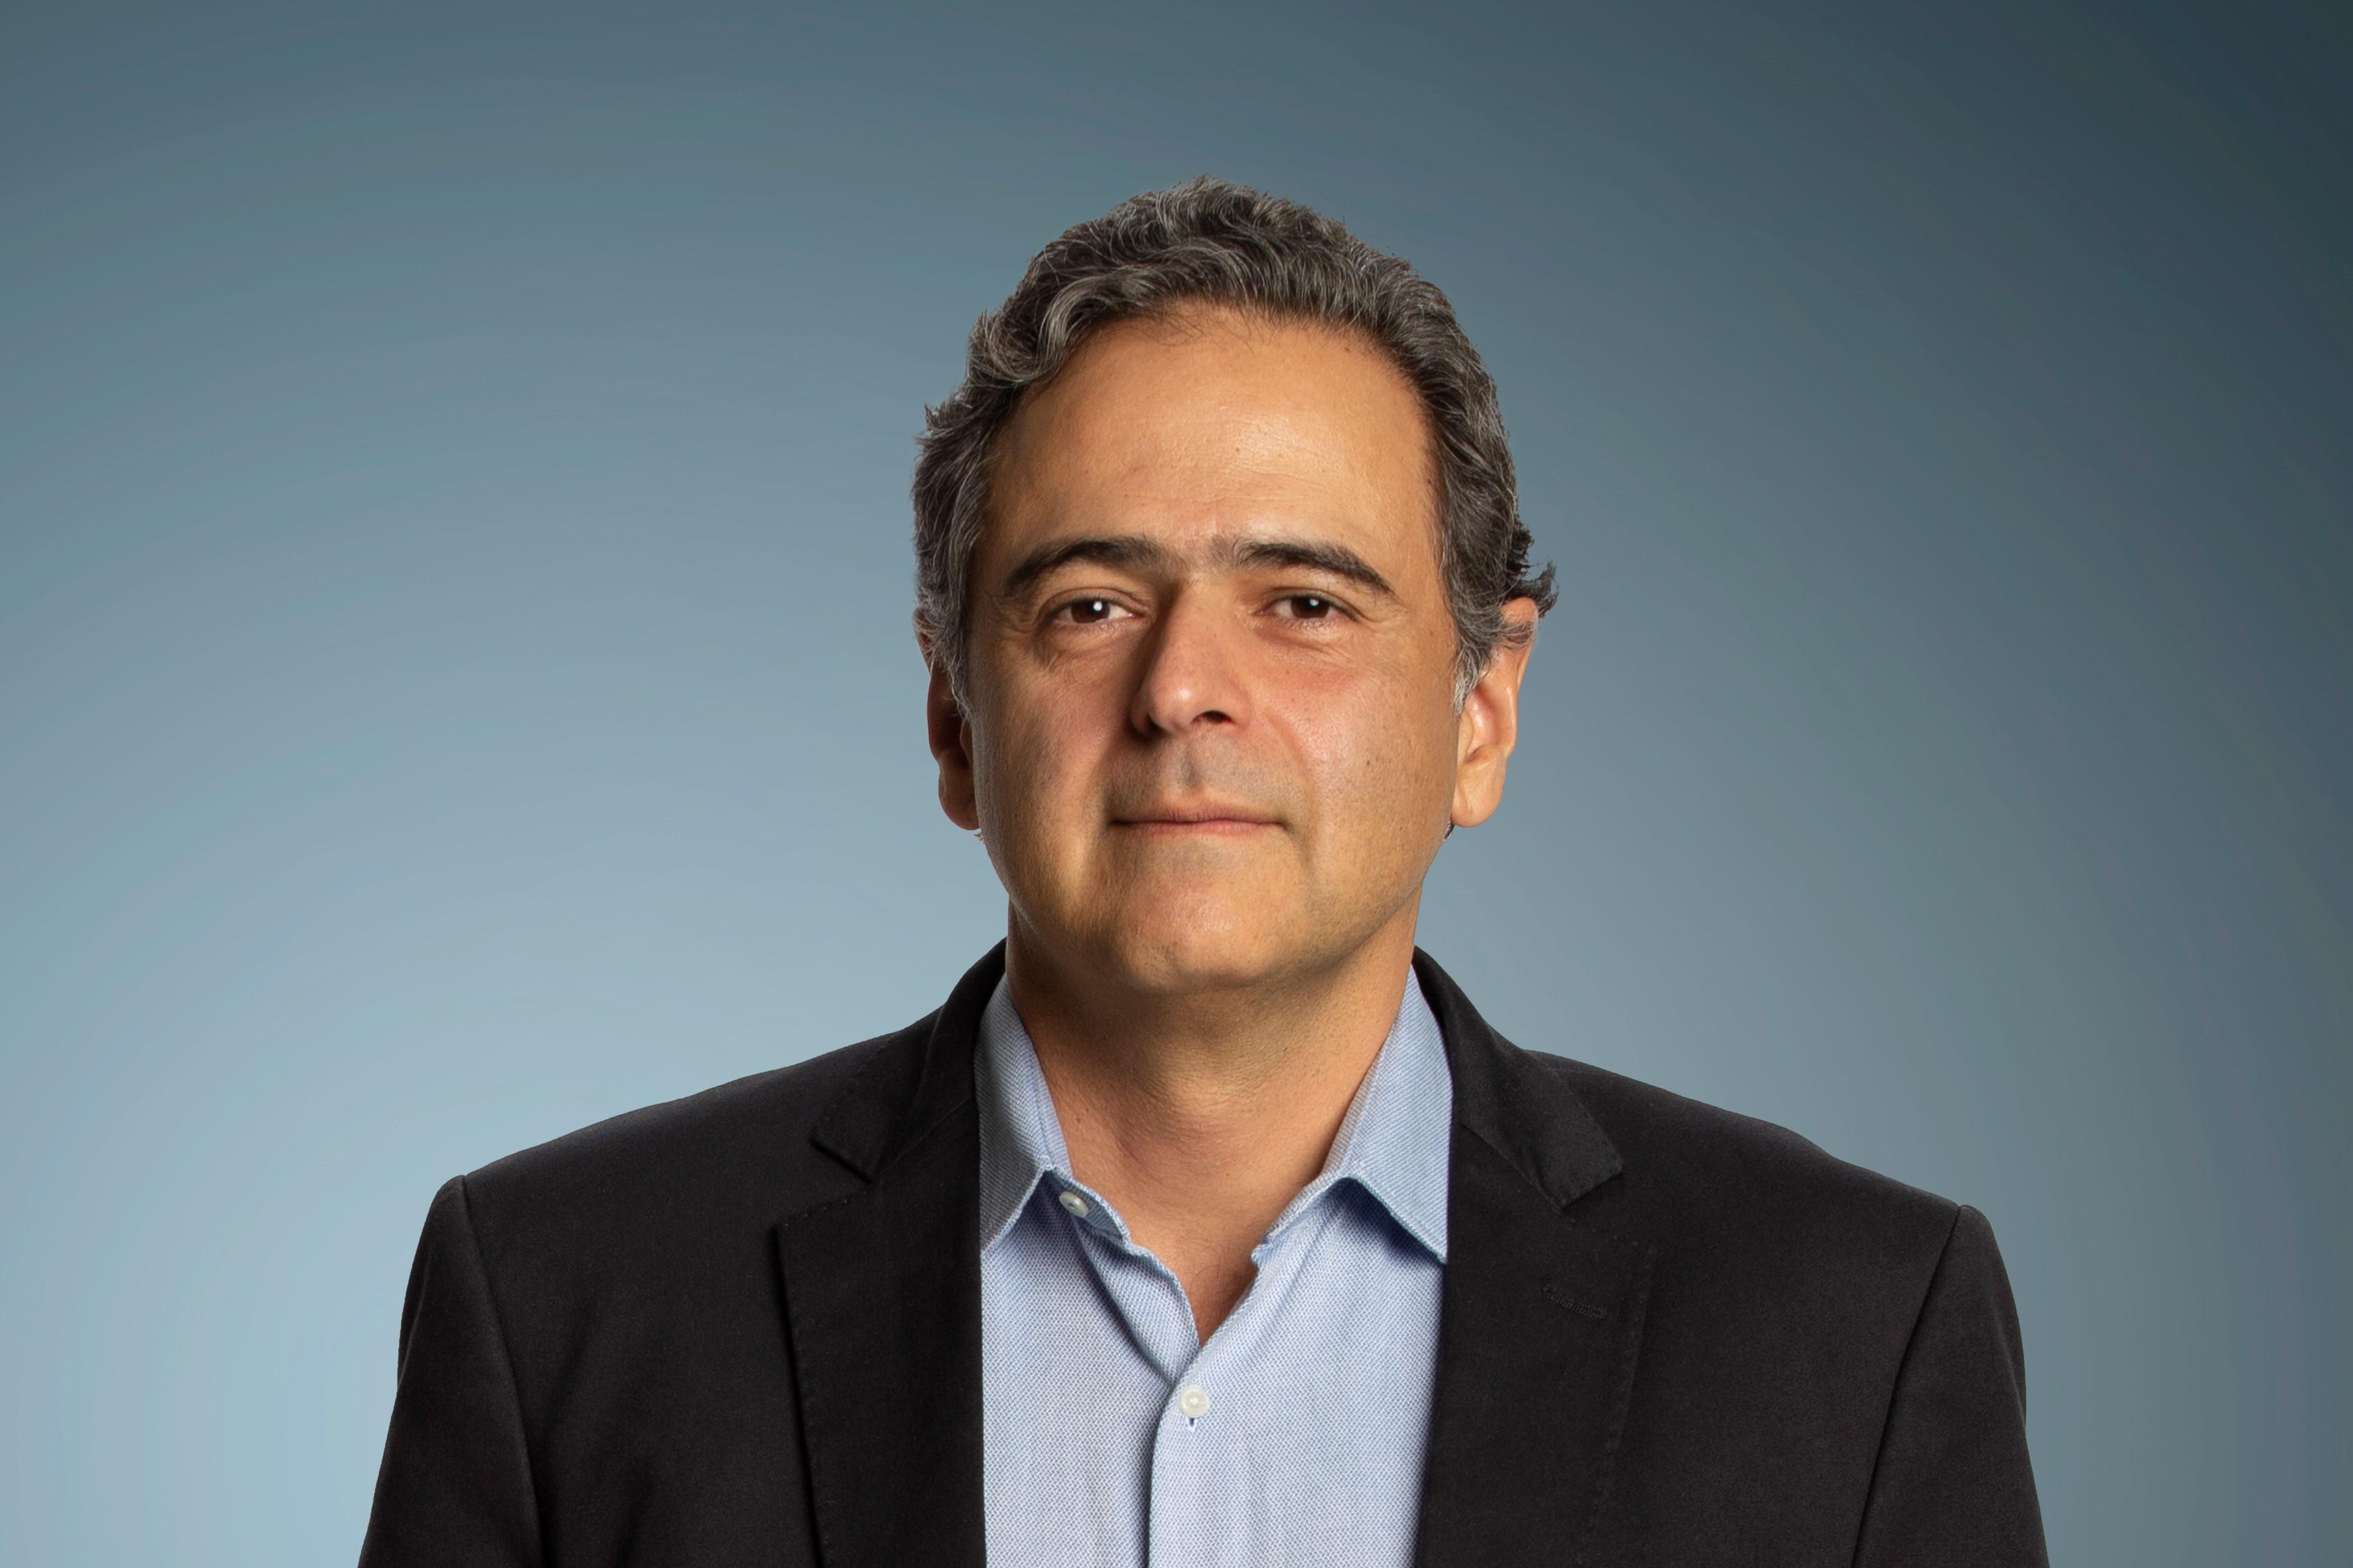 Lourival Sant'Anna comentarista e colunista CNN Brasil